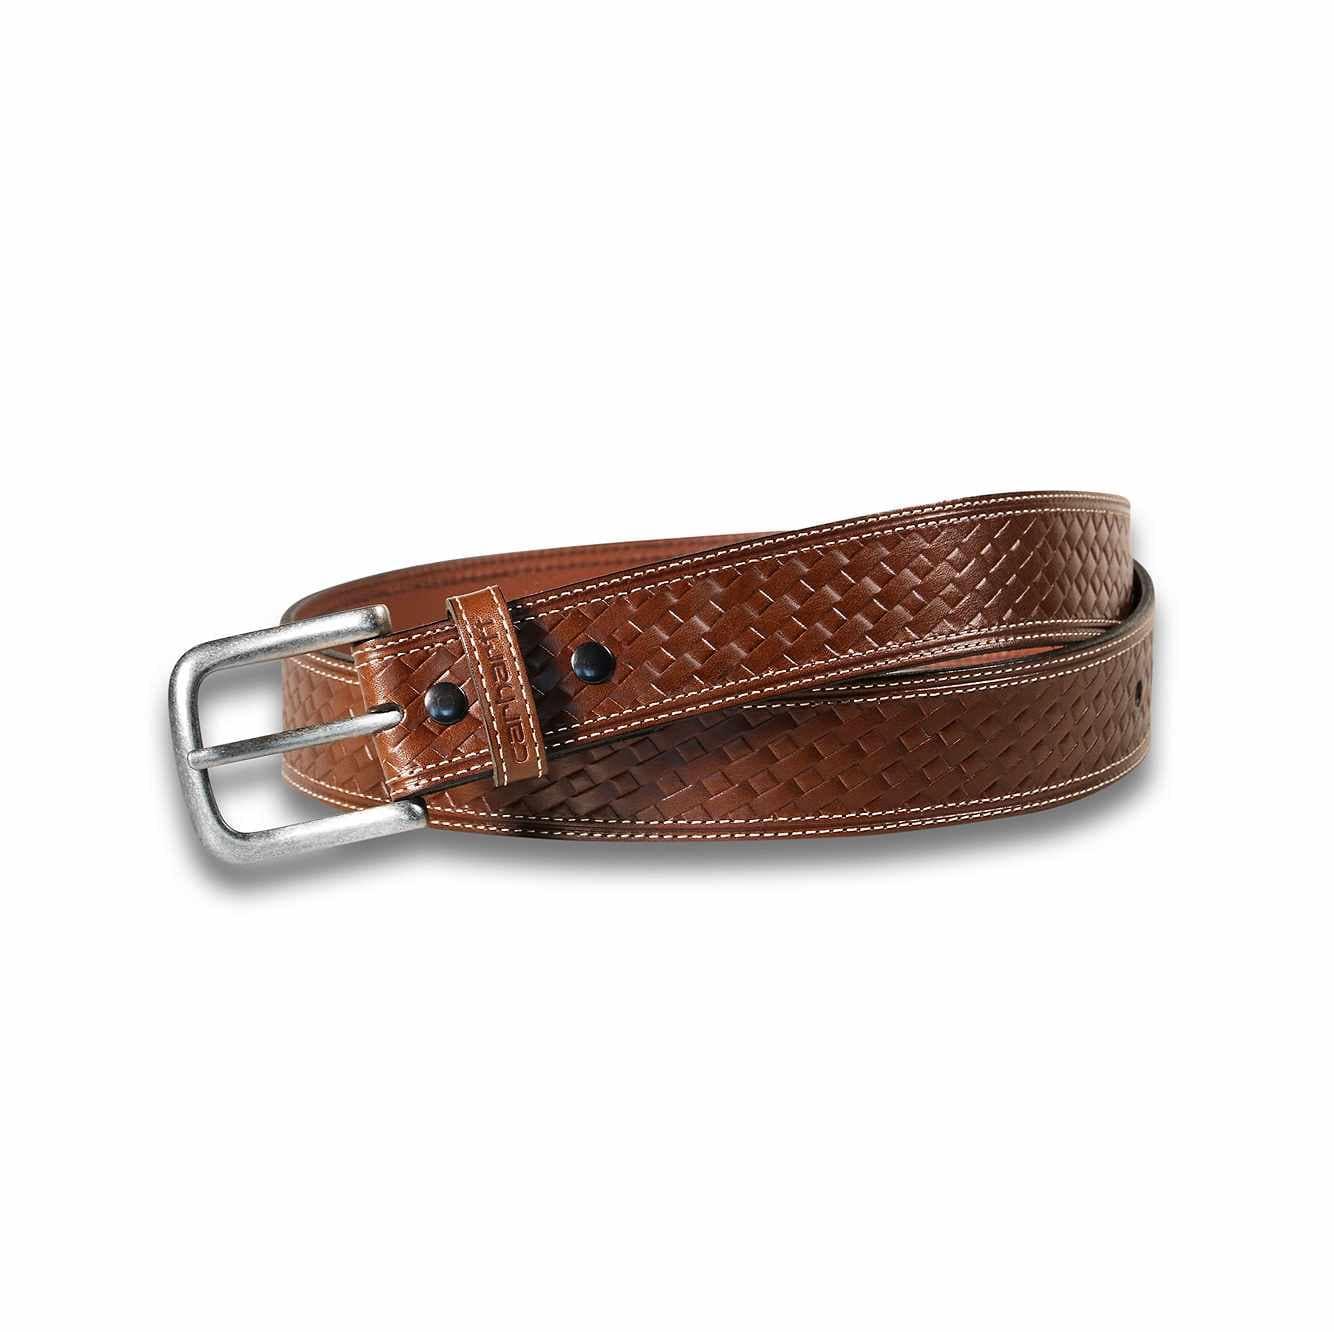 Picture of Basketweave Belt in Brown